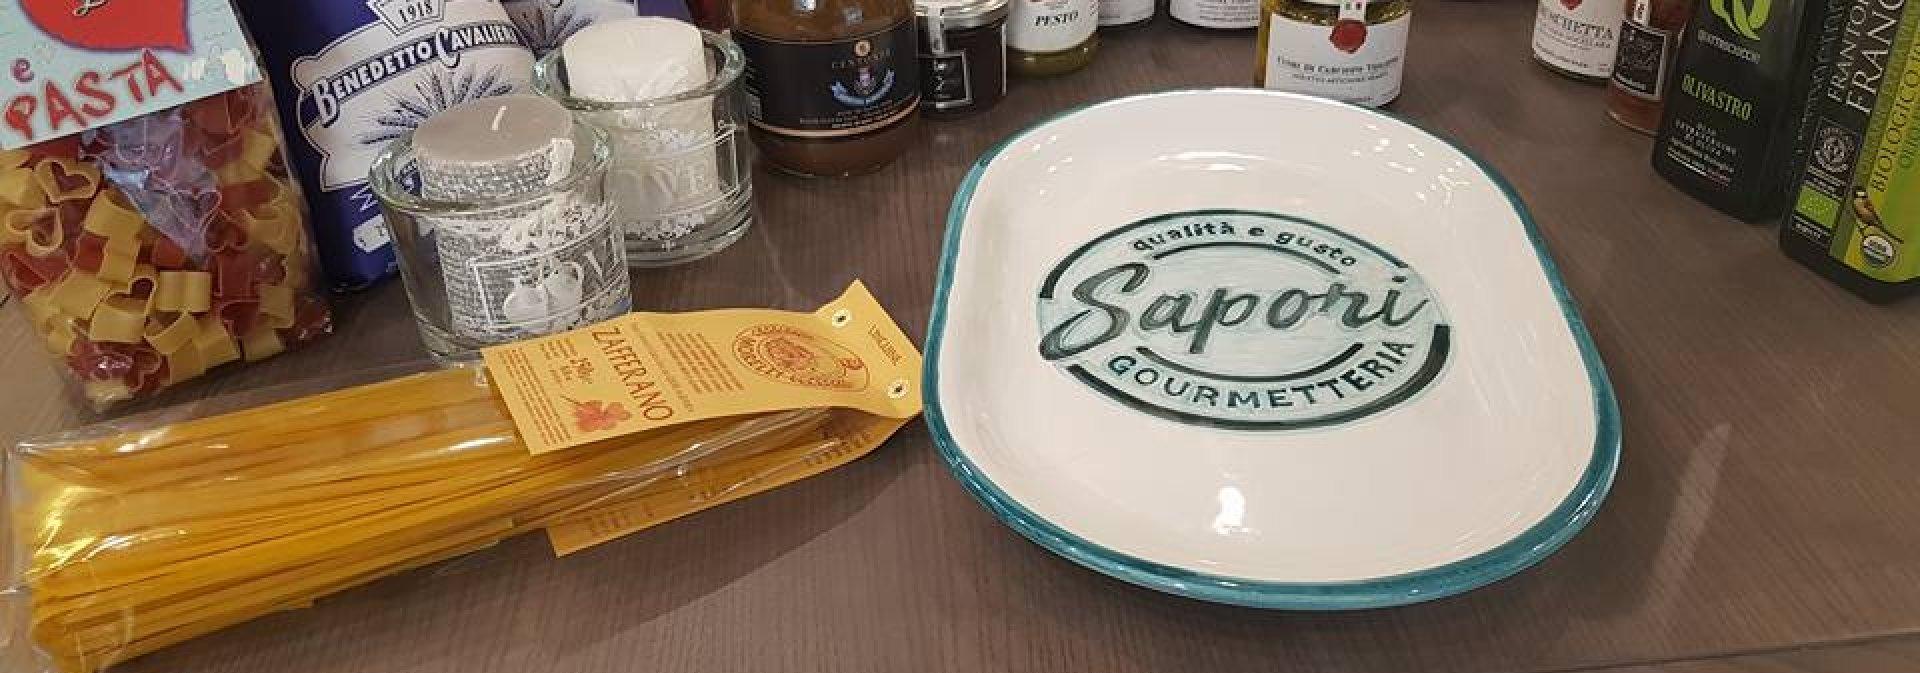 Gourmetteria Sapori, Iași